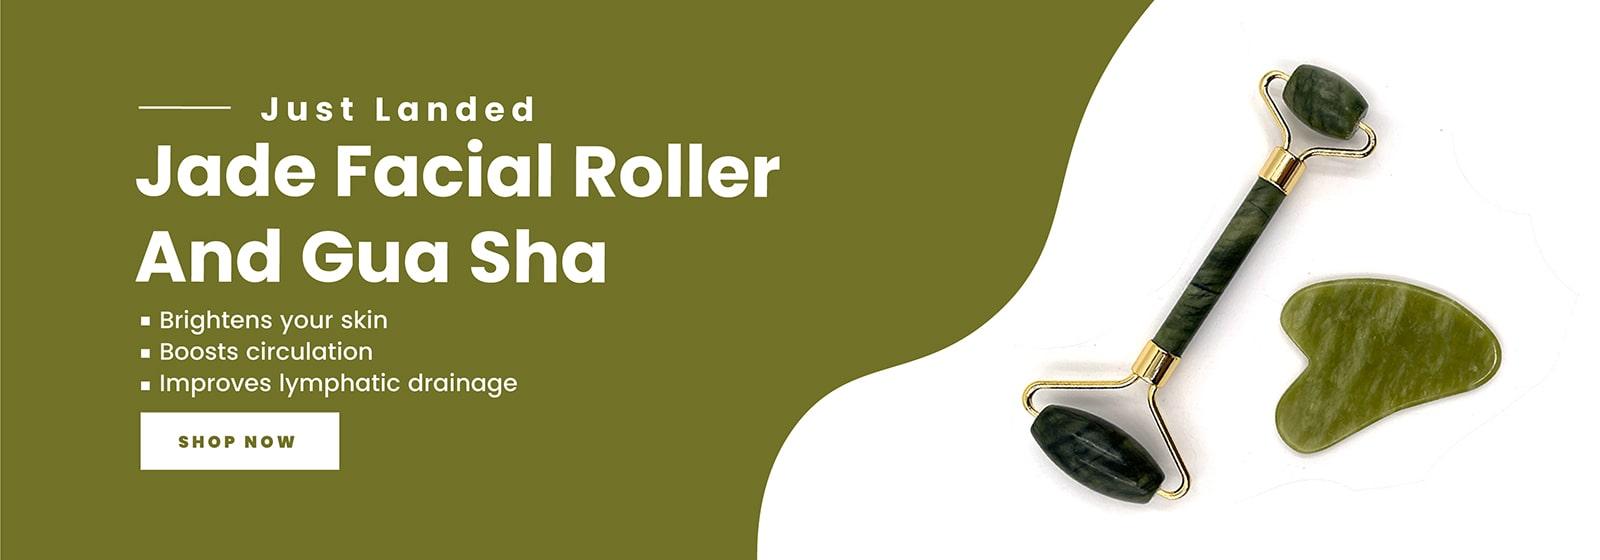 Gua Sha and jade roller